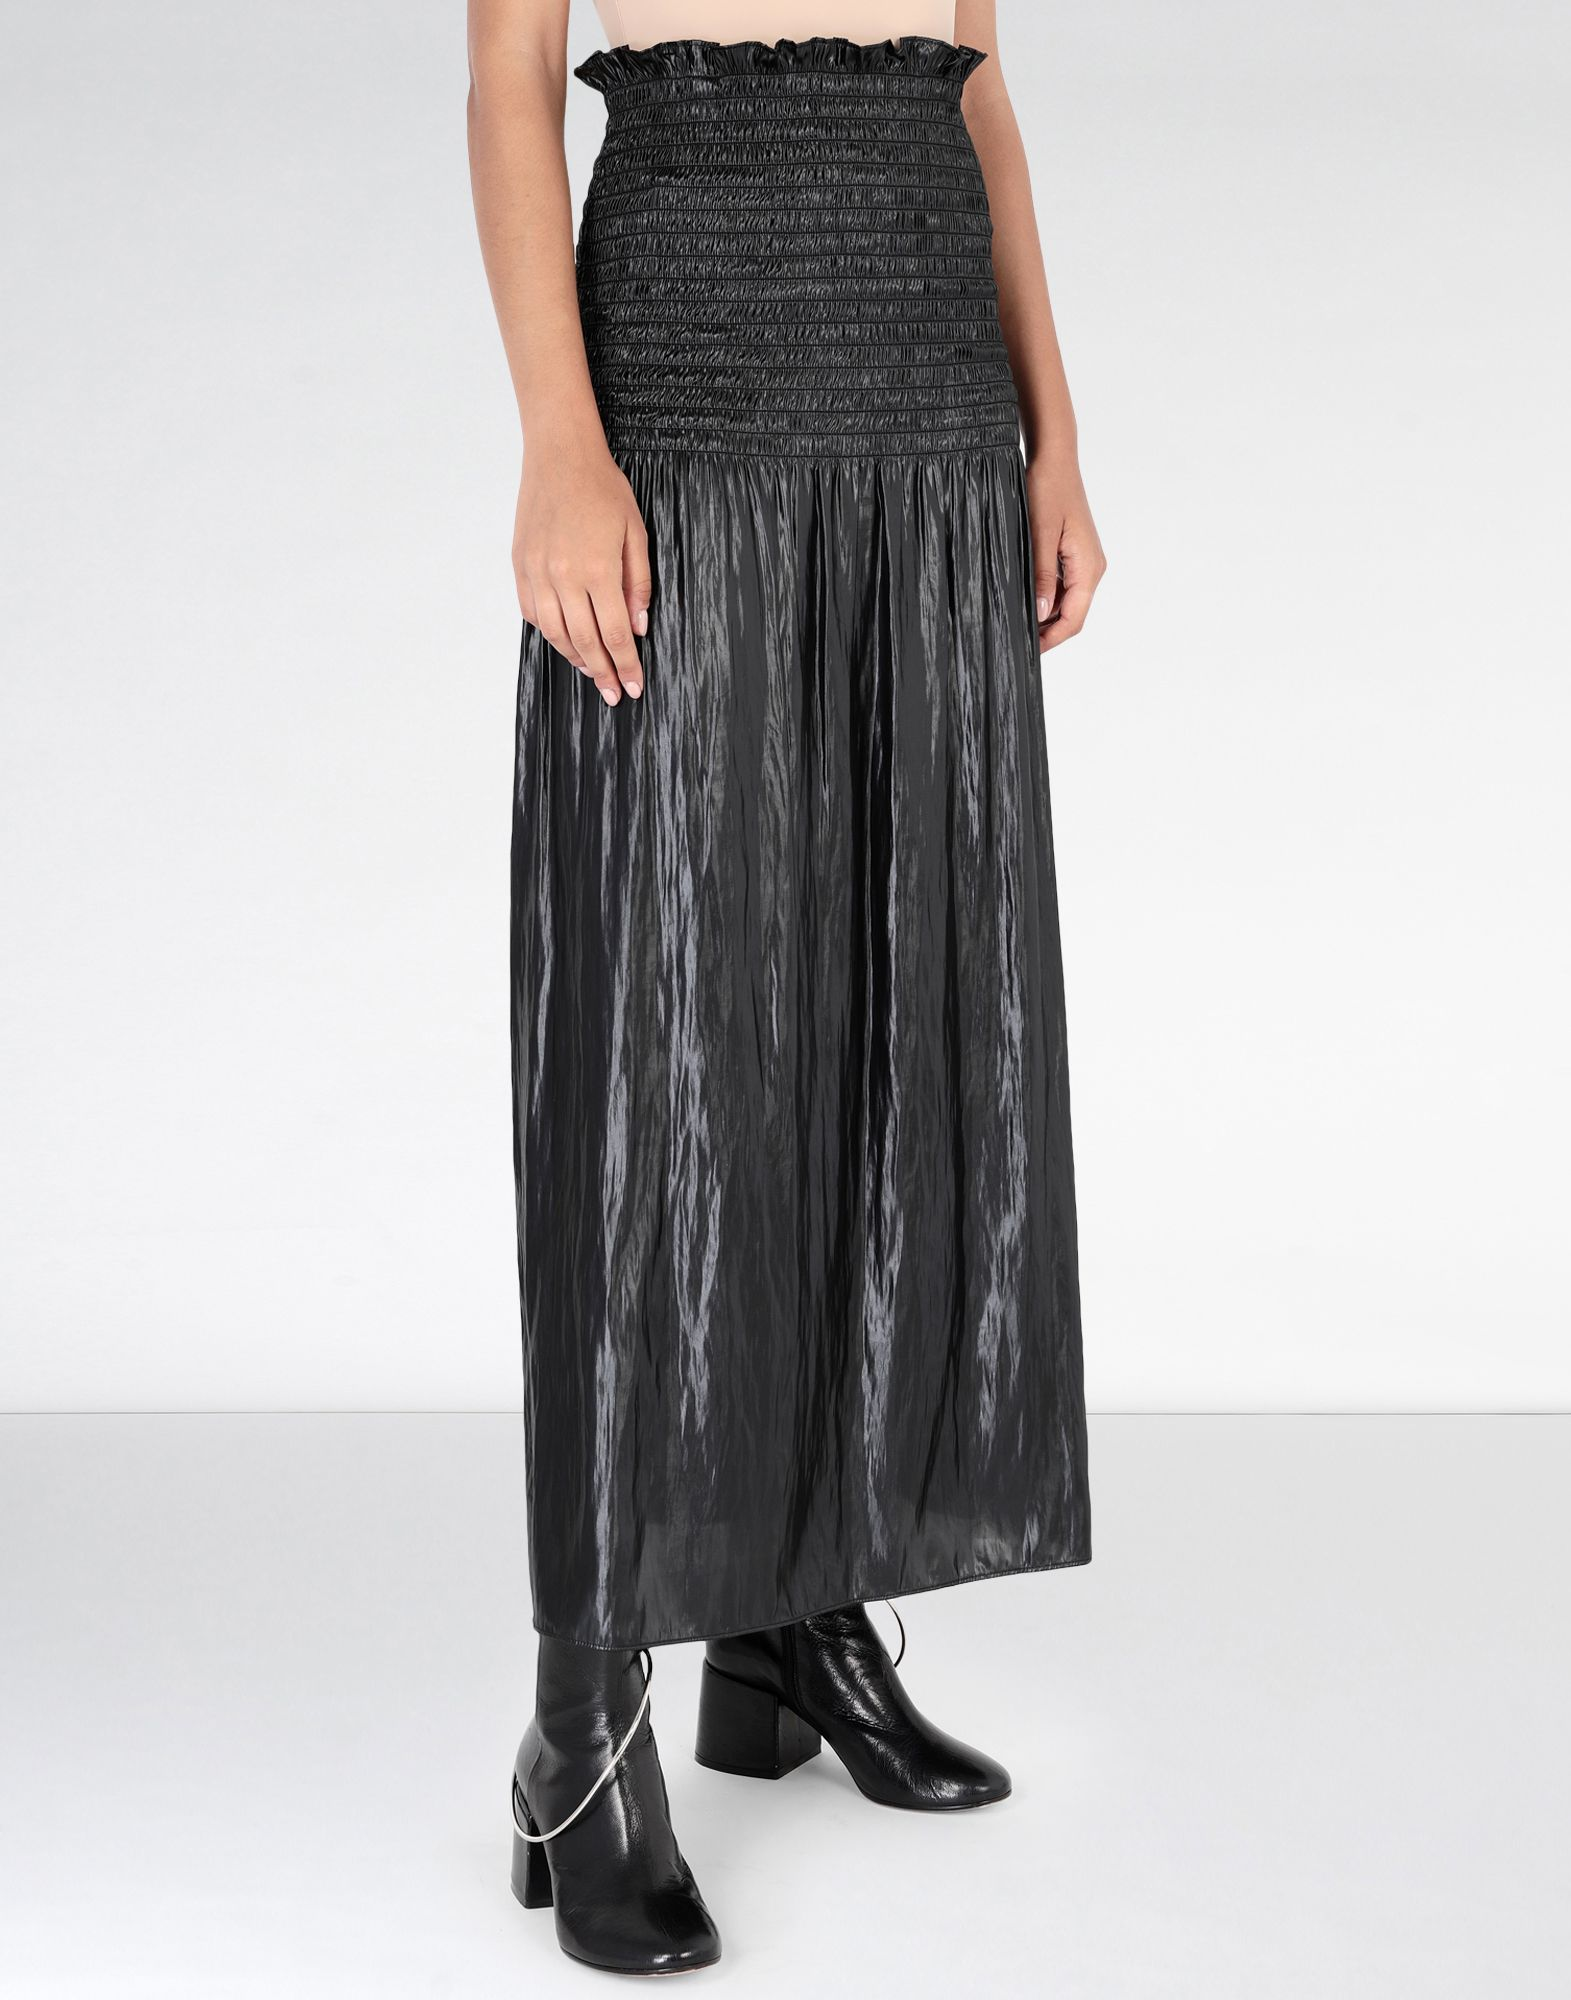 MM6 MAISON MARGIELA Fluid satin dress 3/4 length dress Woman e